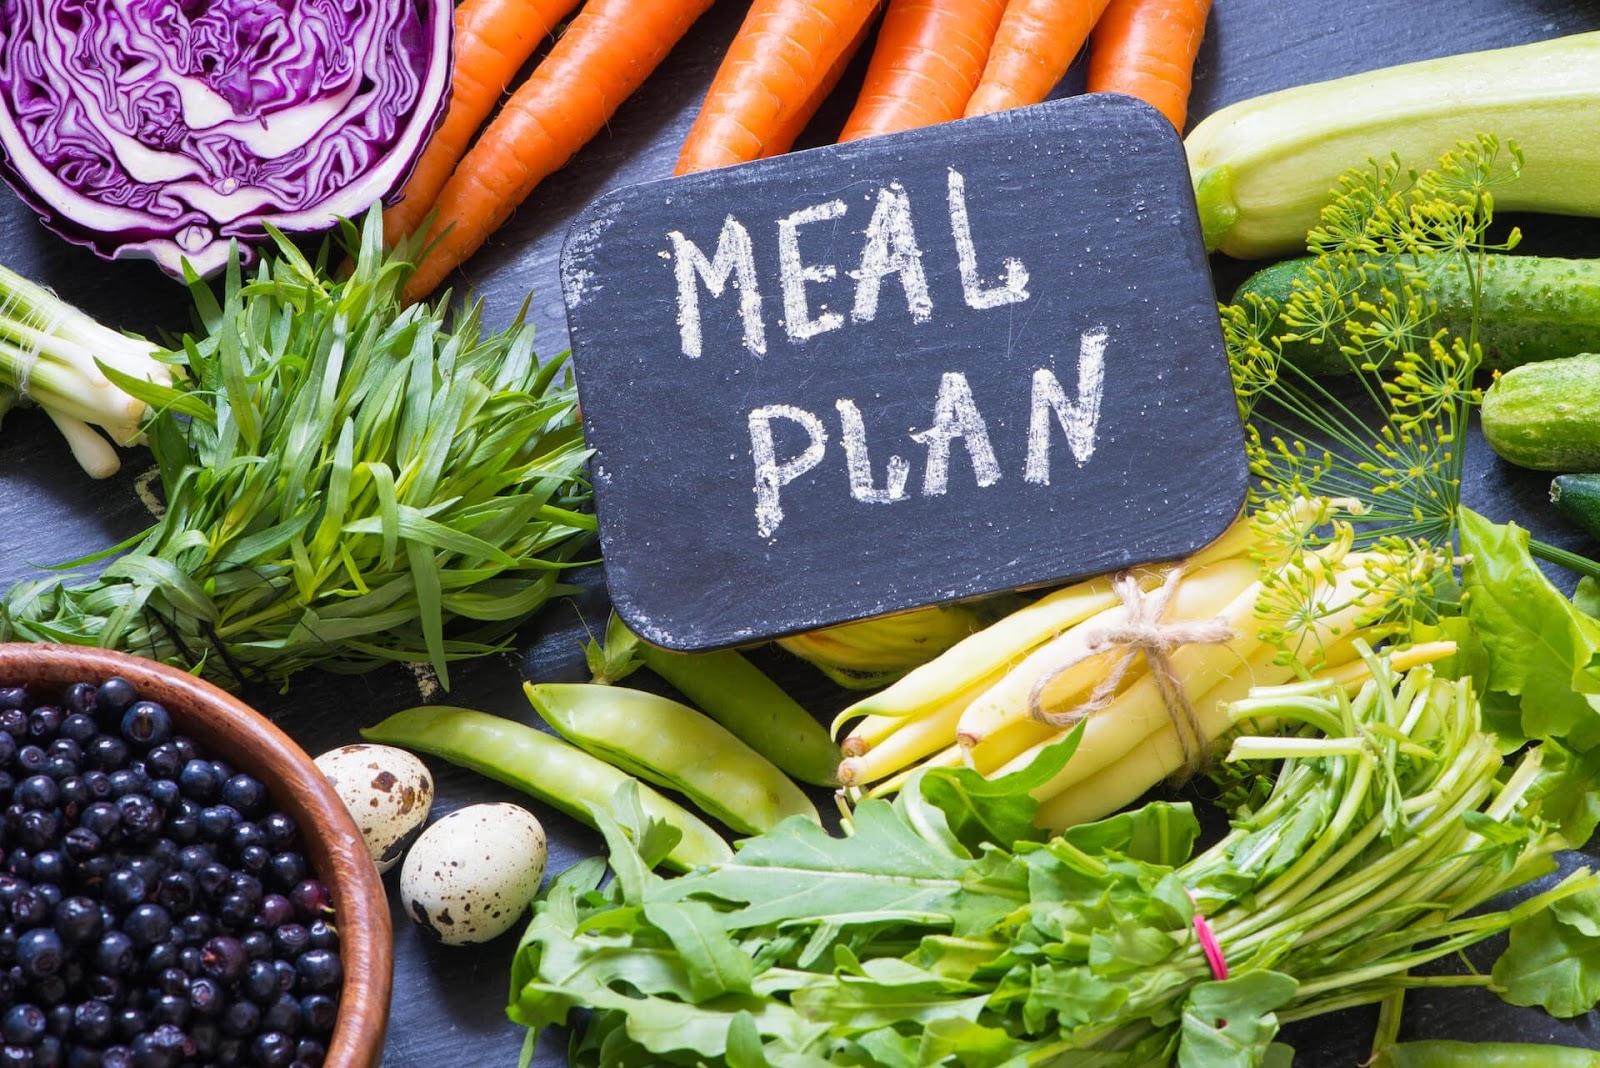 Meal plan sign on top of veggies